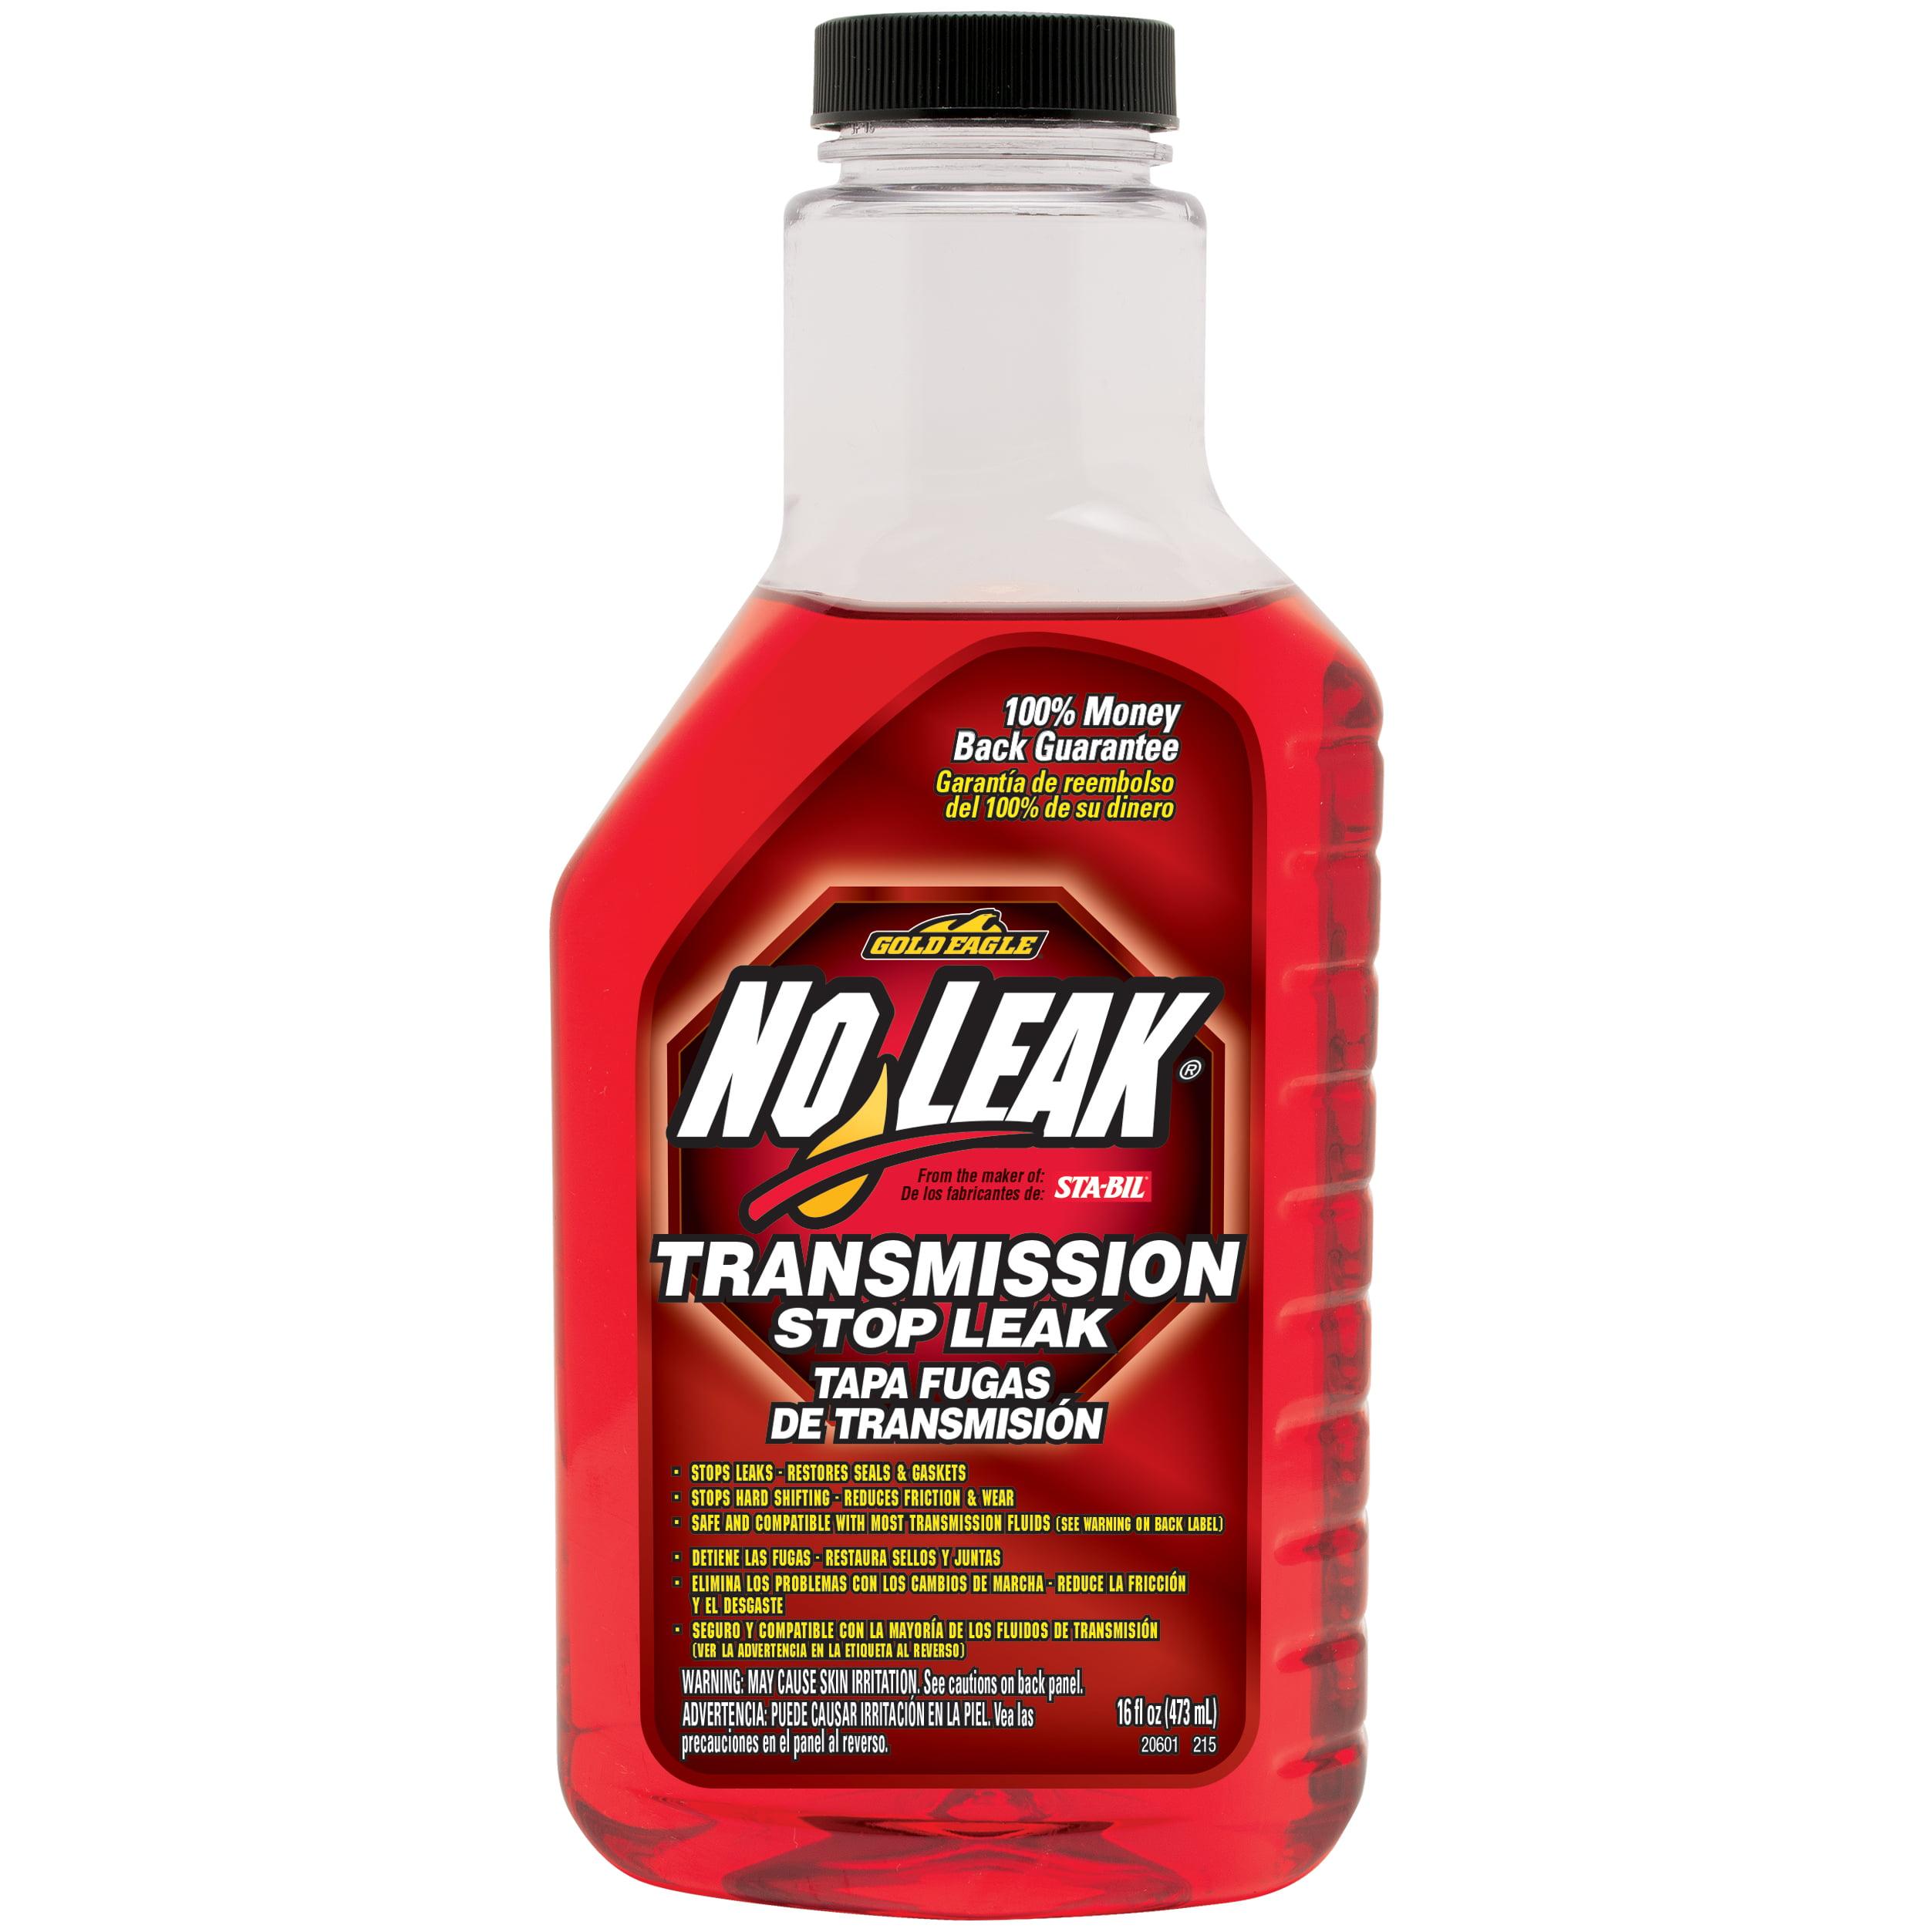 NO LEAK (20601) Transmission Treatment, 16 oz